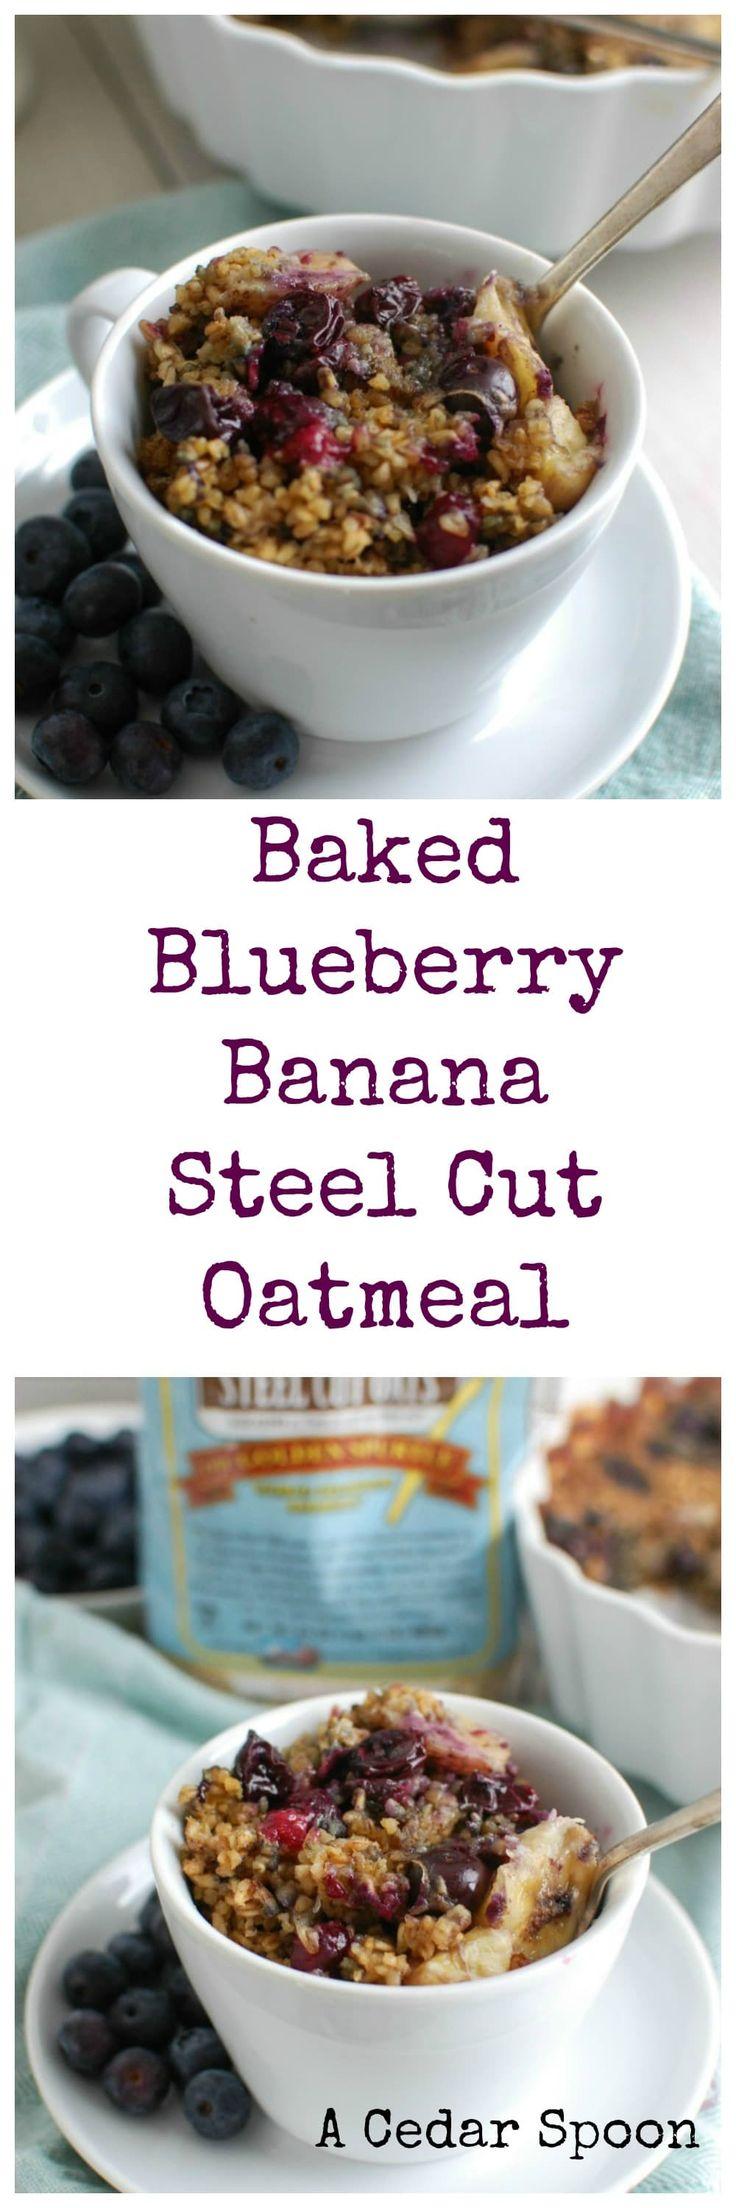 Baked Blueberry Banana Steel Cut Oatmeal - healthy snack